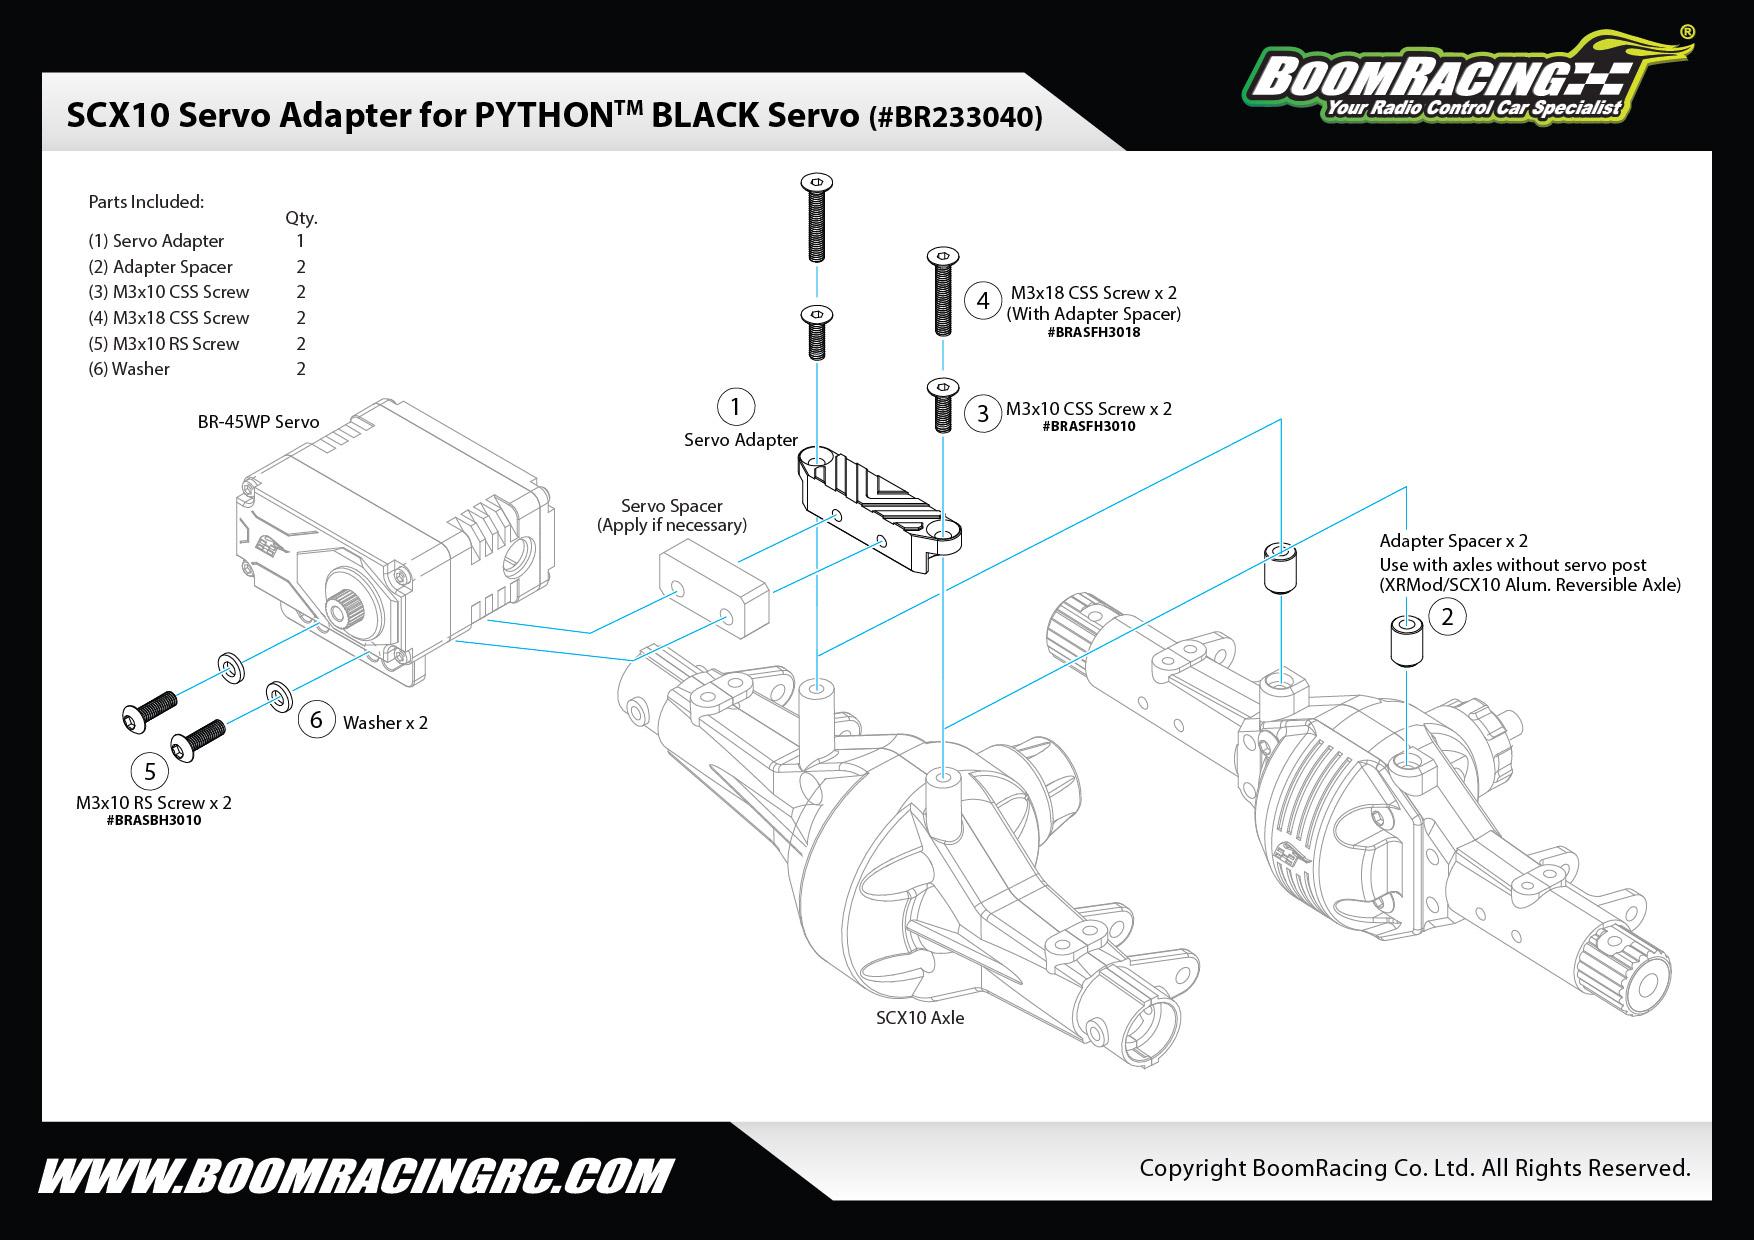 Chassis & Suspension Servo Adapter for PYTHON™ BLACK Servo